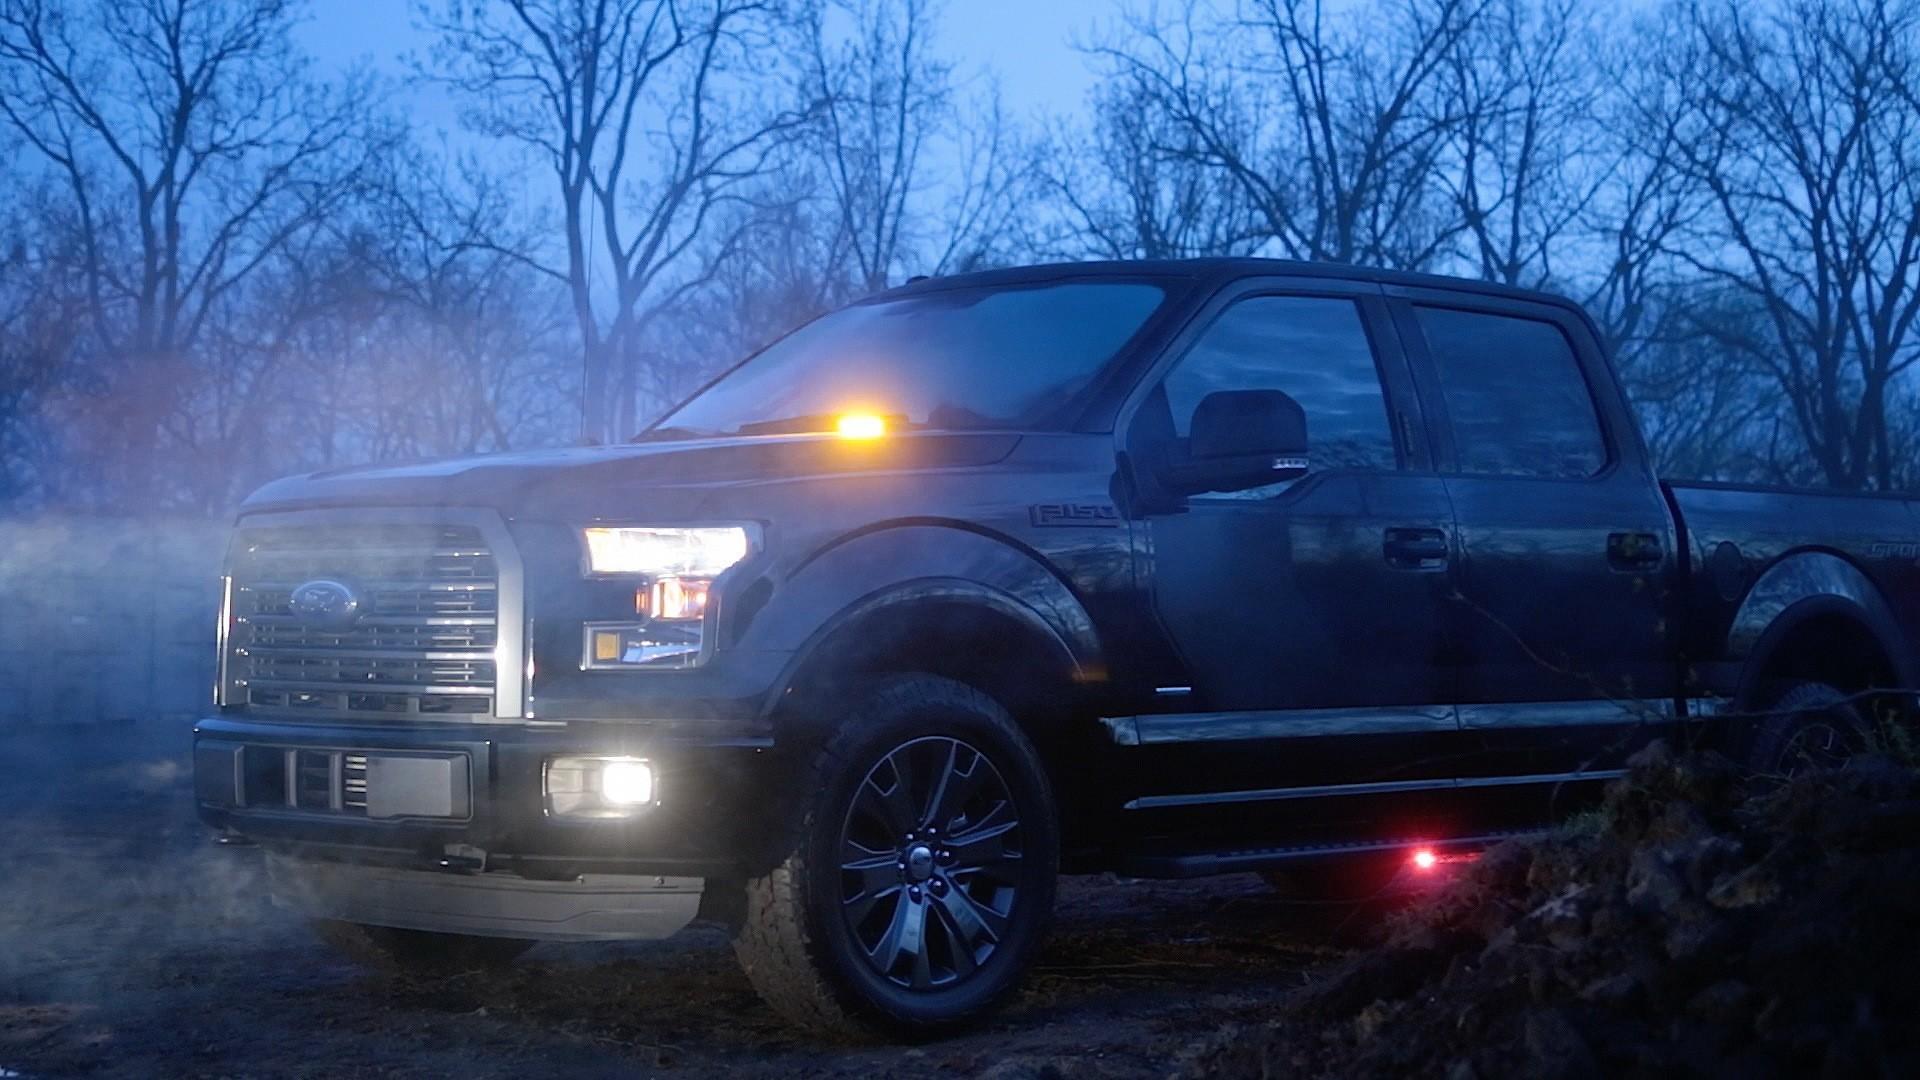 Led Strobe Lights For Trucks >> Ford F 150 Gets Factory Installed Led Strobe Lights For First Time